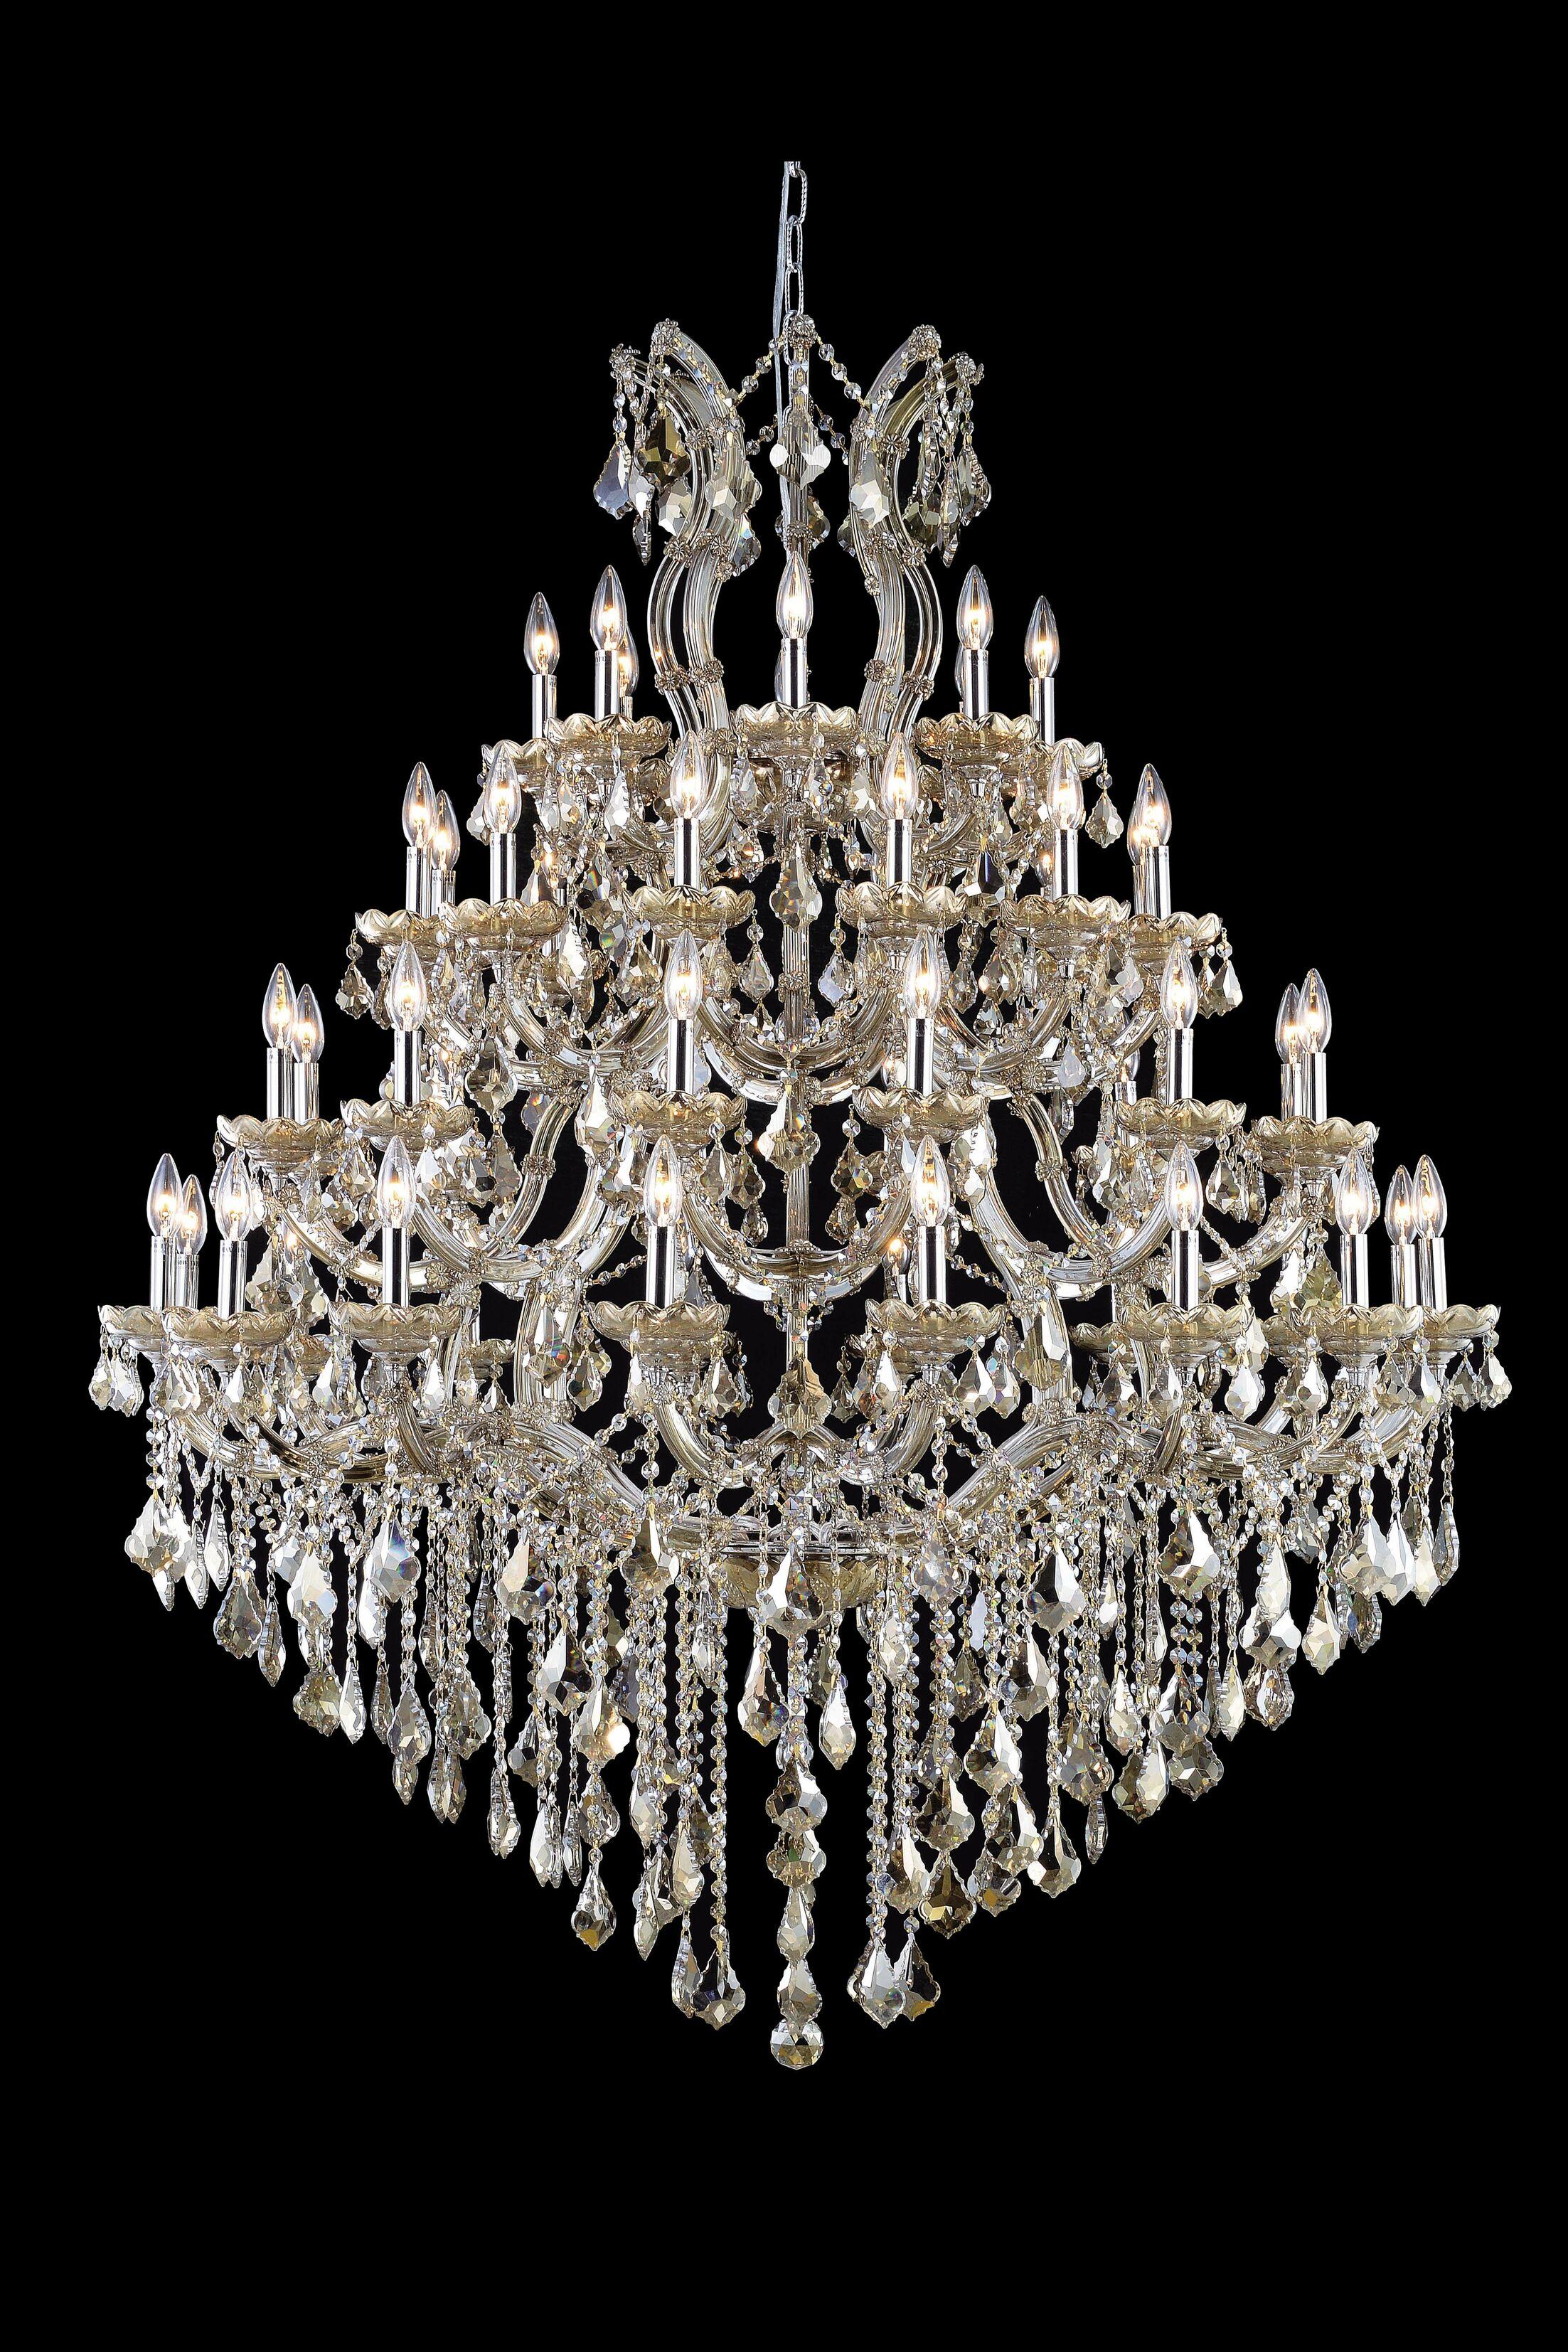 Regina 49-Light Swarovski Elements Candle Style Chandelier Size: 60